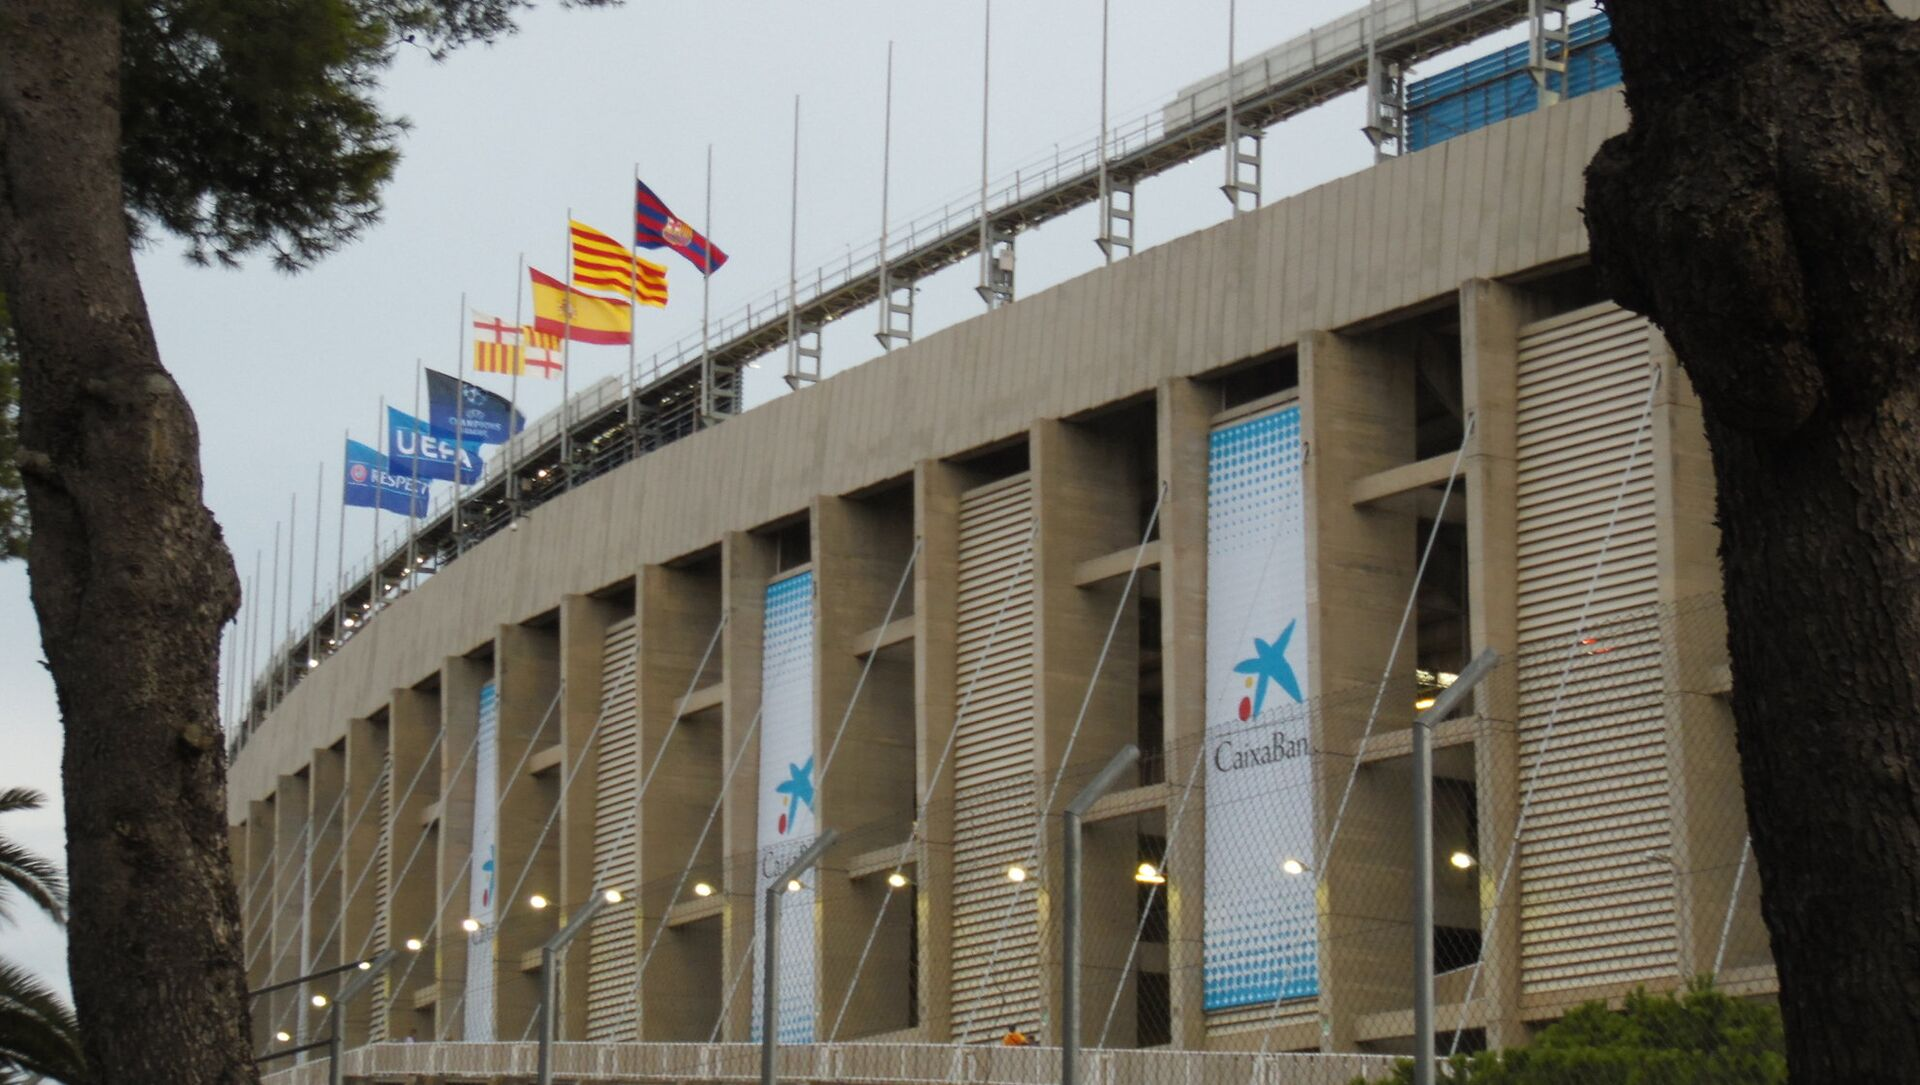 El estadio Camp Nou, Barcelona - Sputnik Mundo, 1920, 01.08.2018